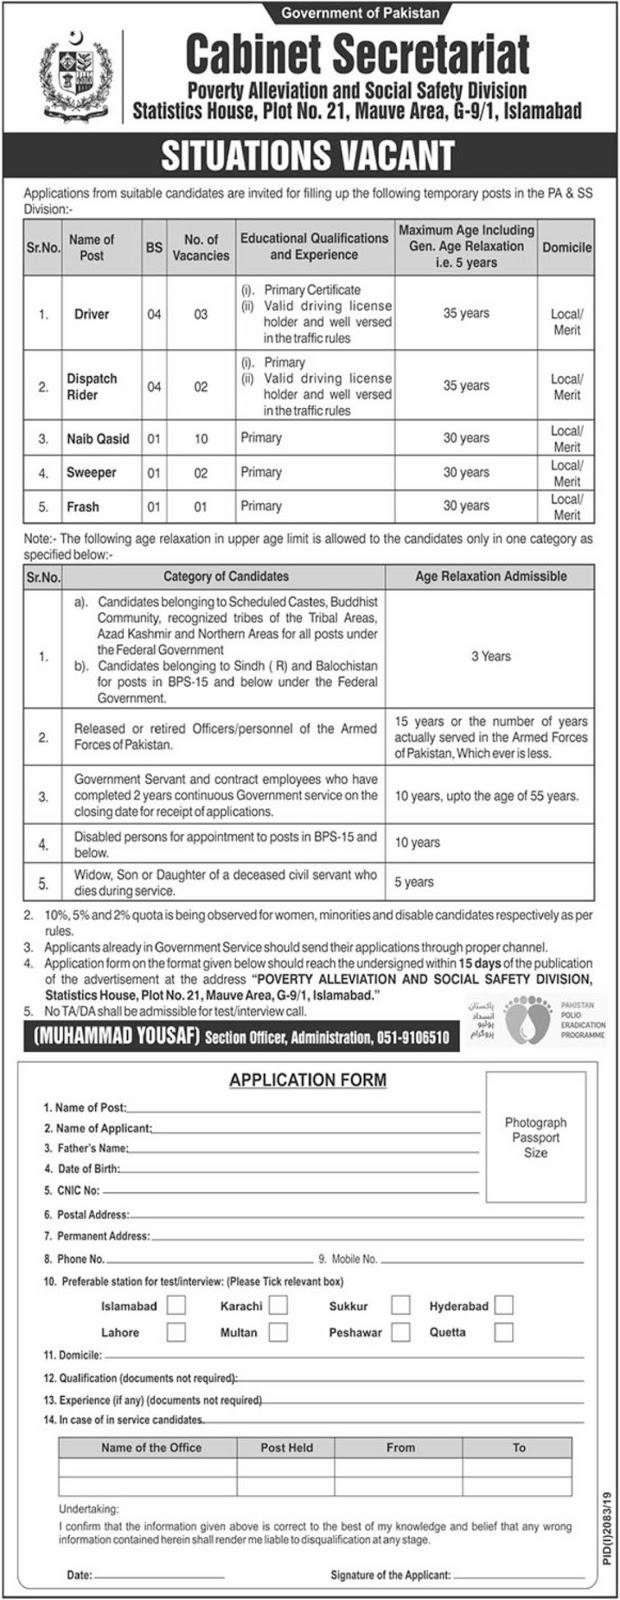 Cabinet Secretariat Jobs Islamabad Pakistan